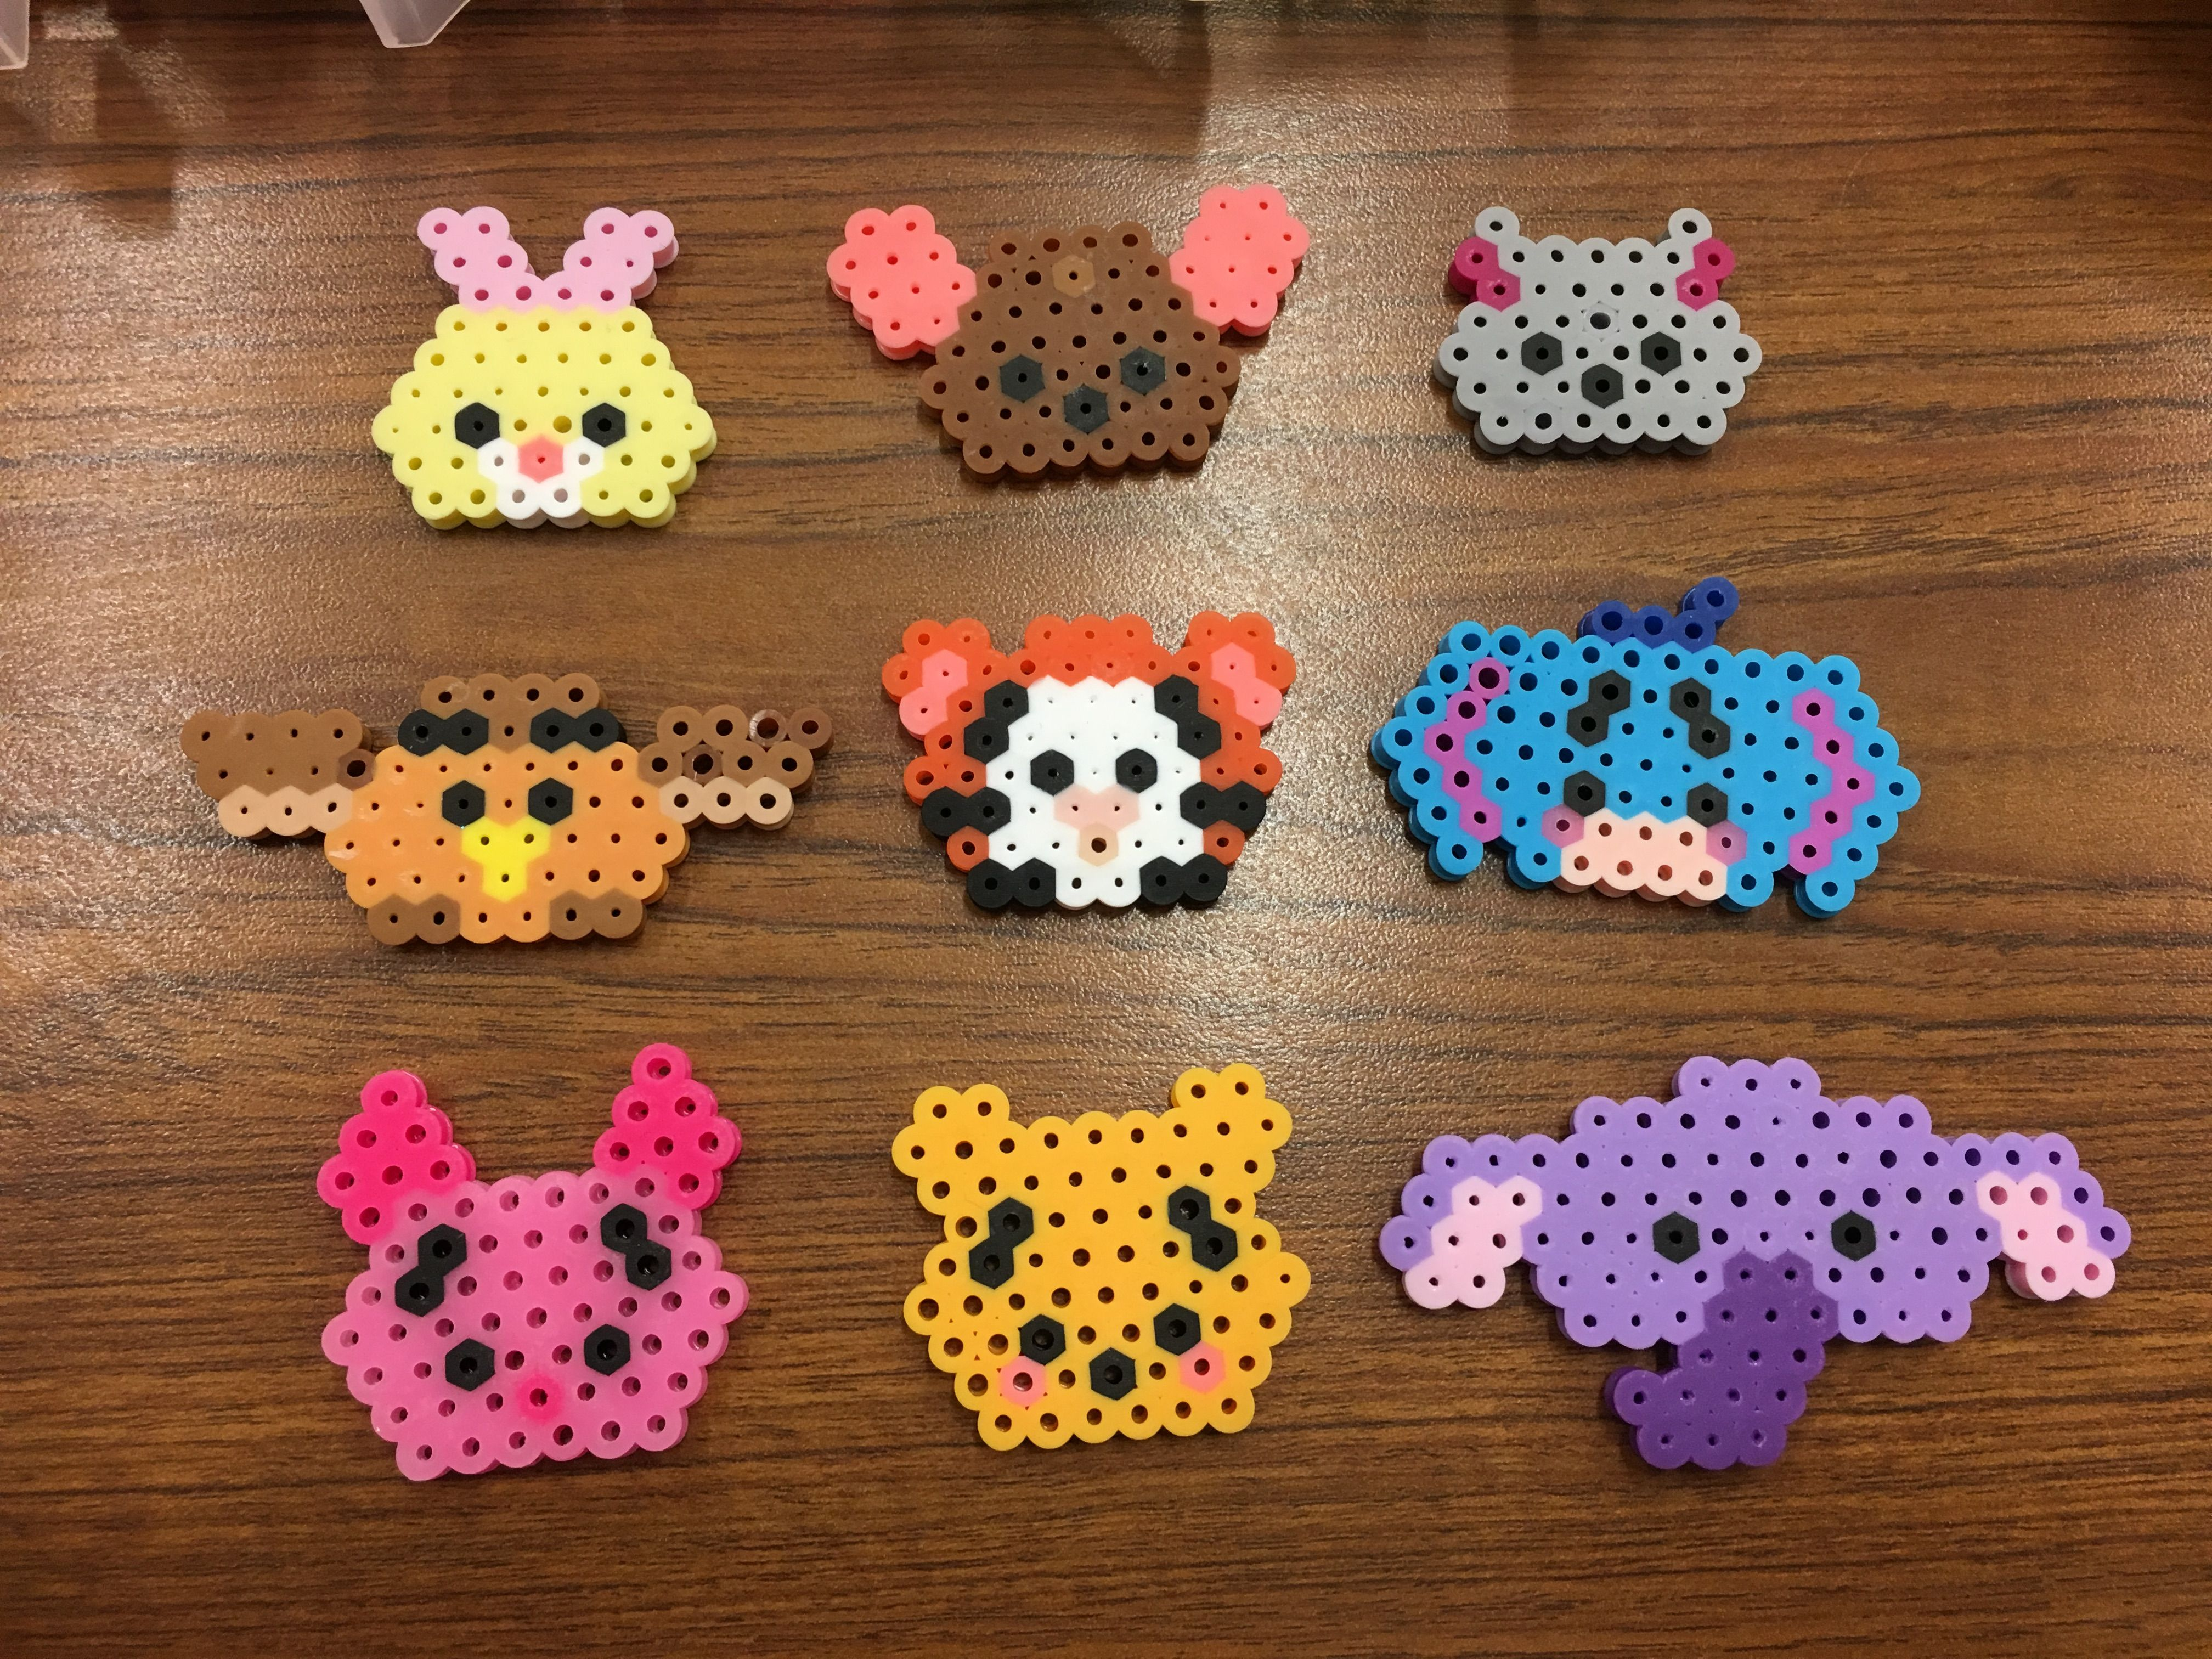 Winnie The Pooh Characters Mini Tsum Tsum Perlers